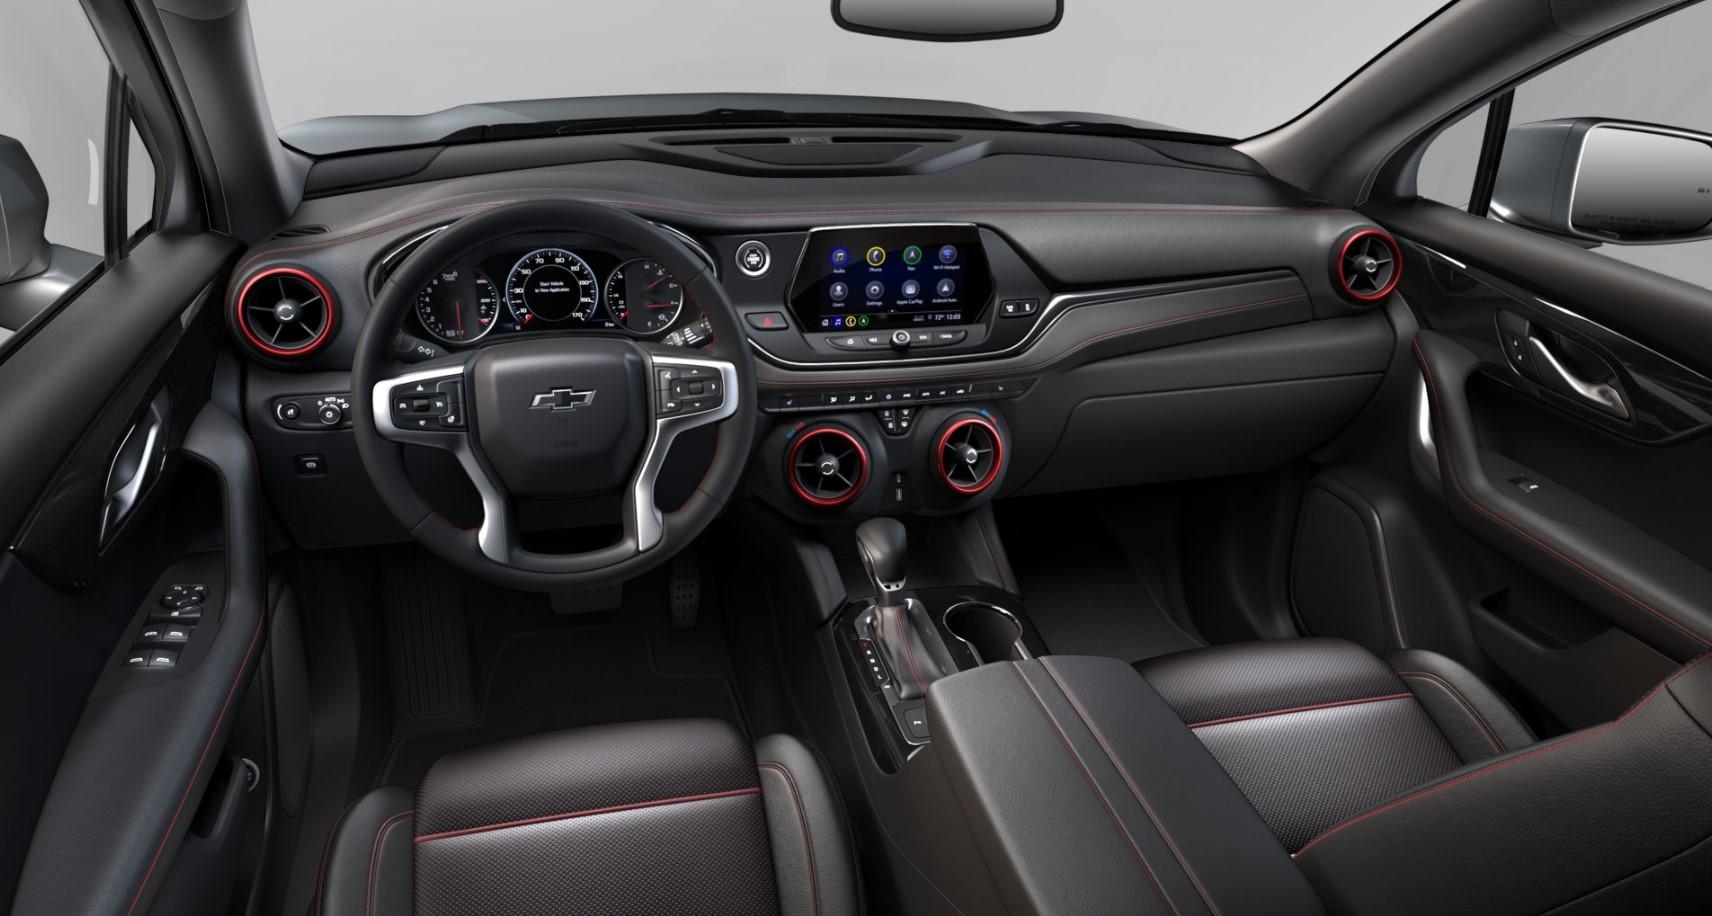 2019 Chevrolet Blazer Rs John Jones Auto Group Salem In